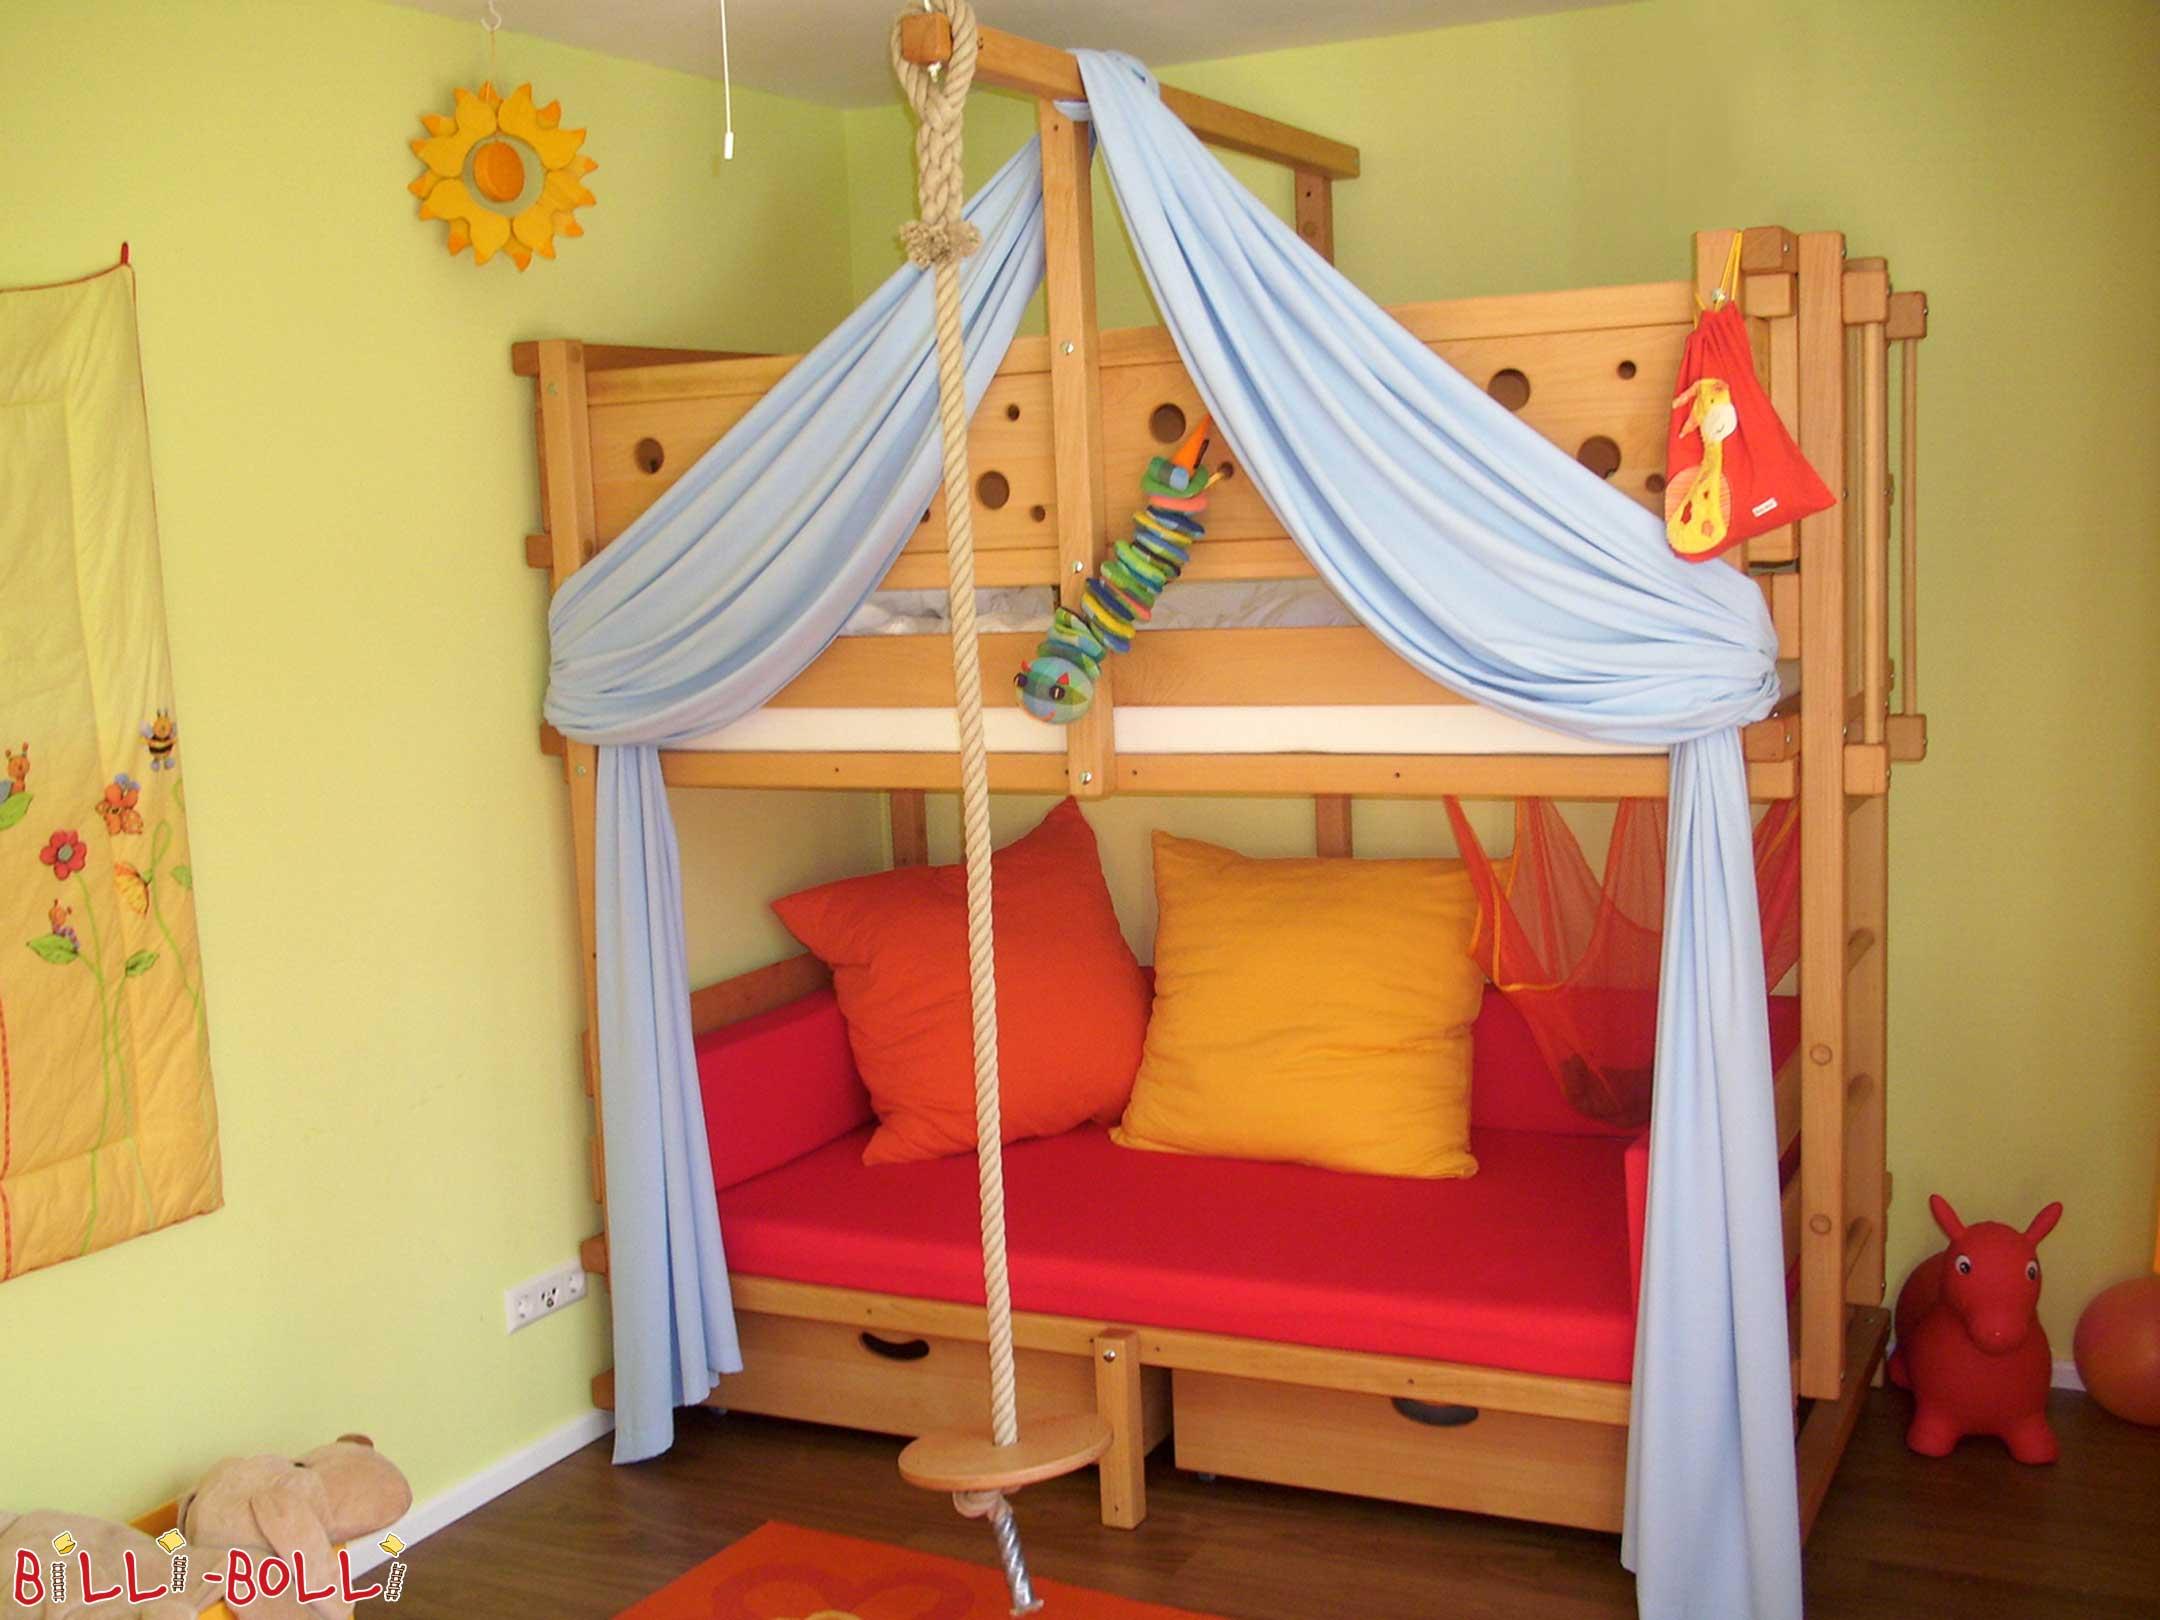 Etagenbett Lukas Gebraucht : Etagenbett billi bolli kindermöbel